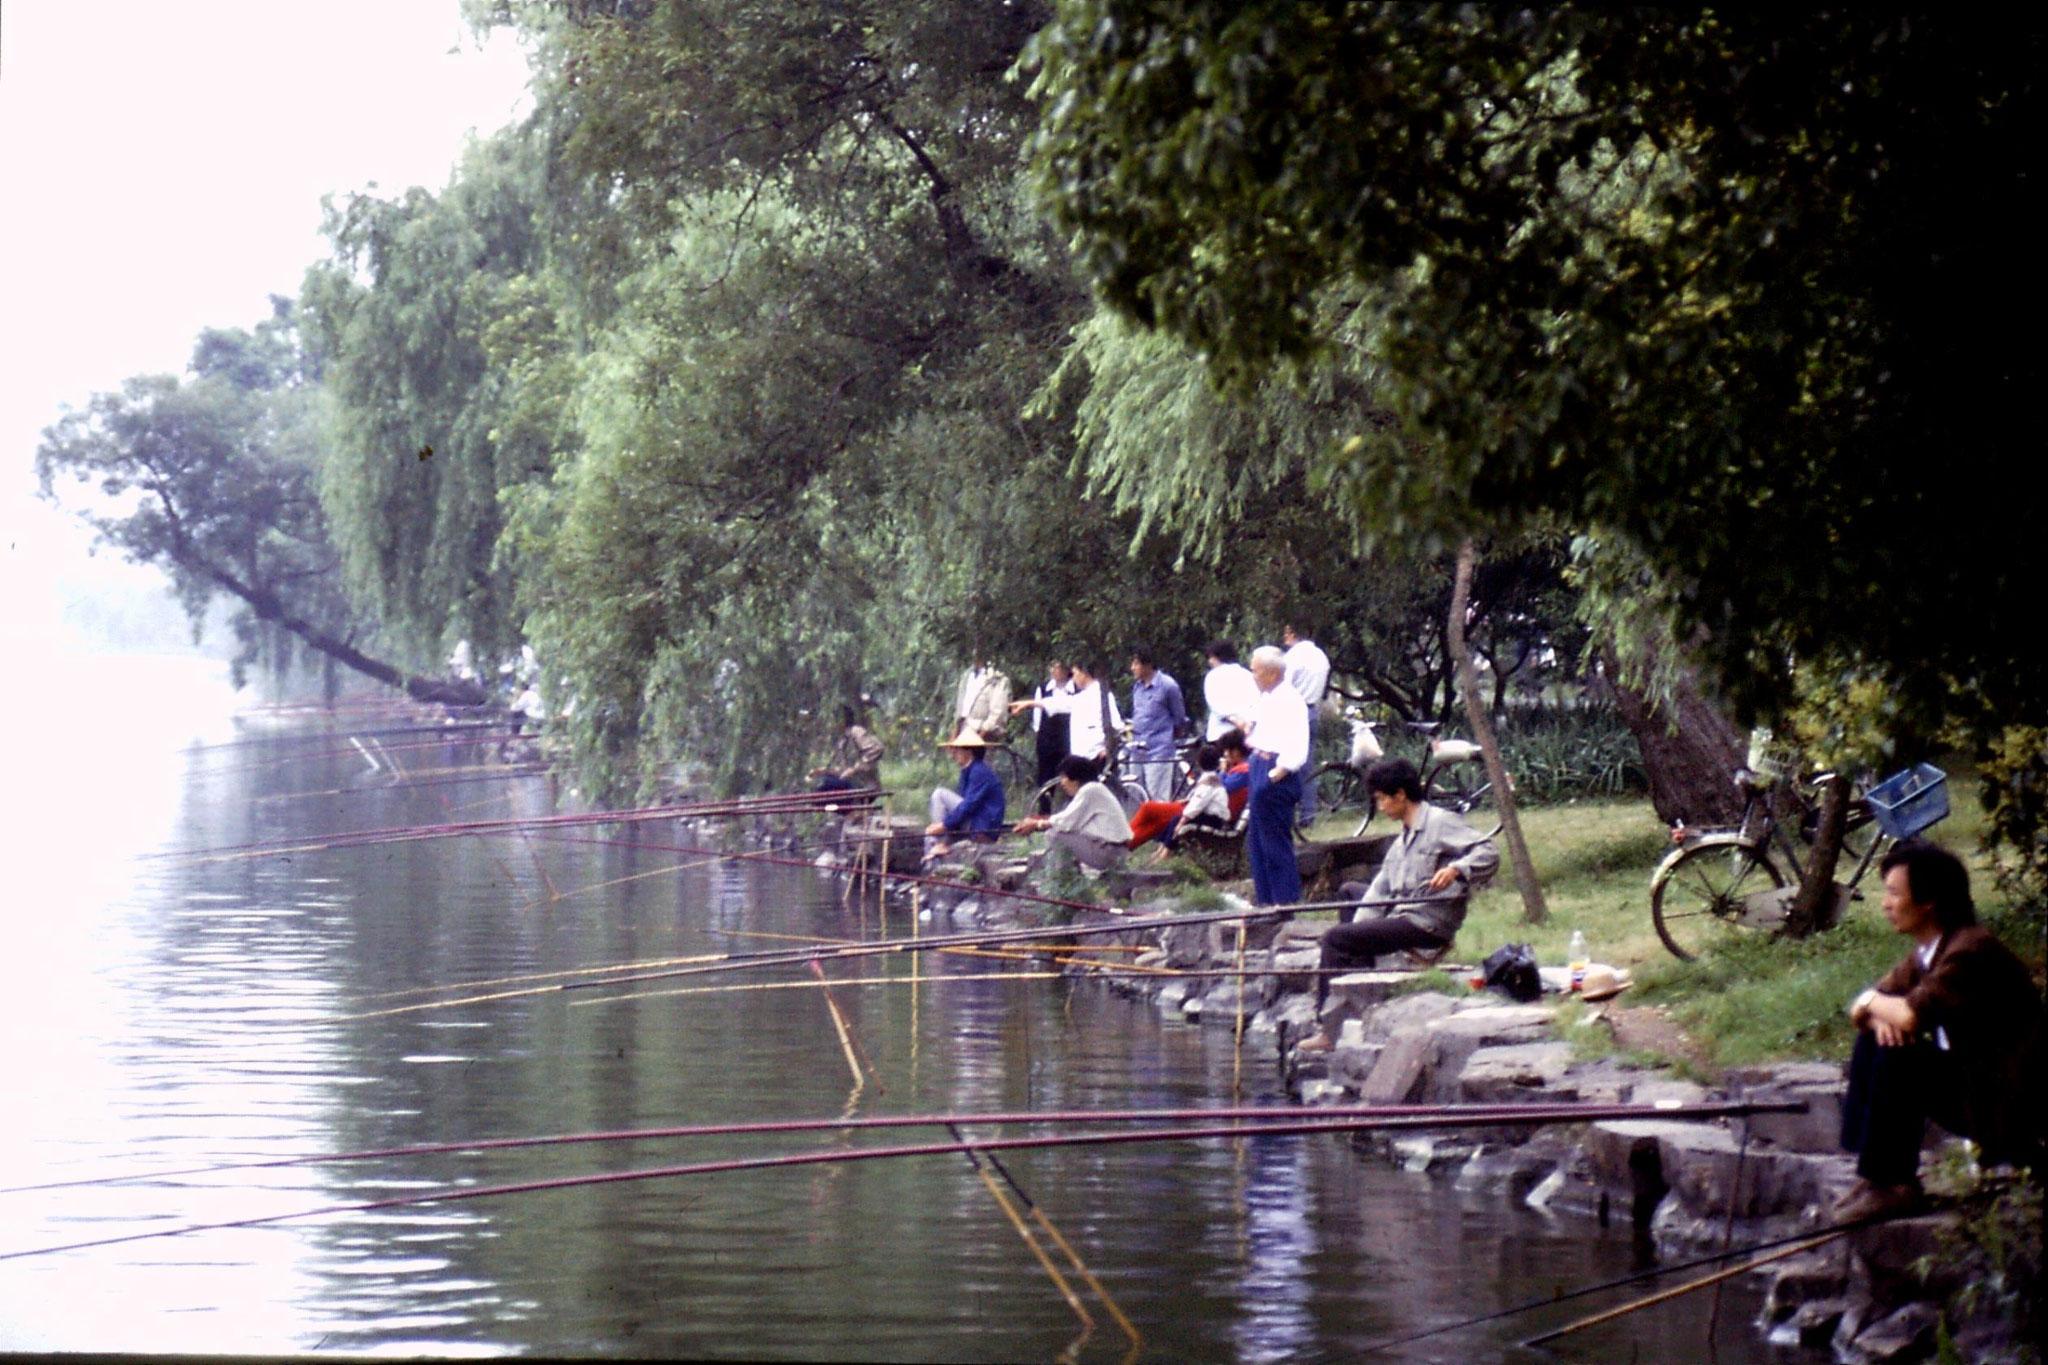 11/6/1989: 16: fishing off Su causeway